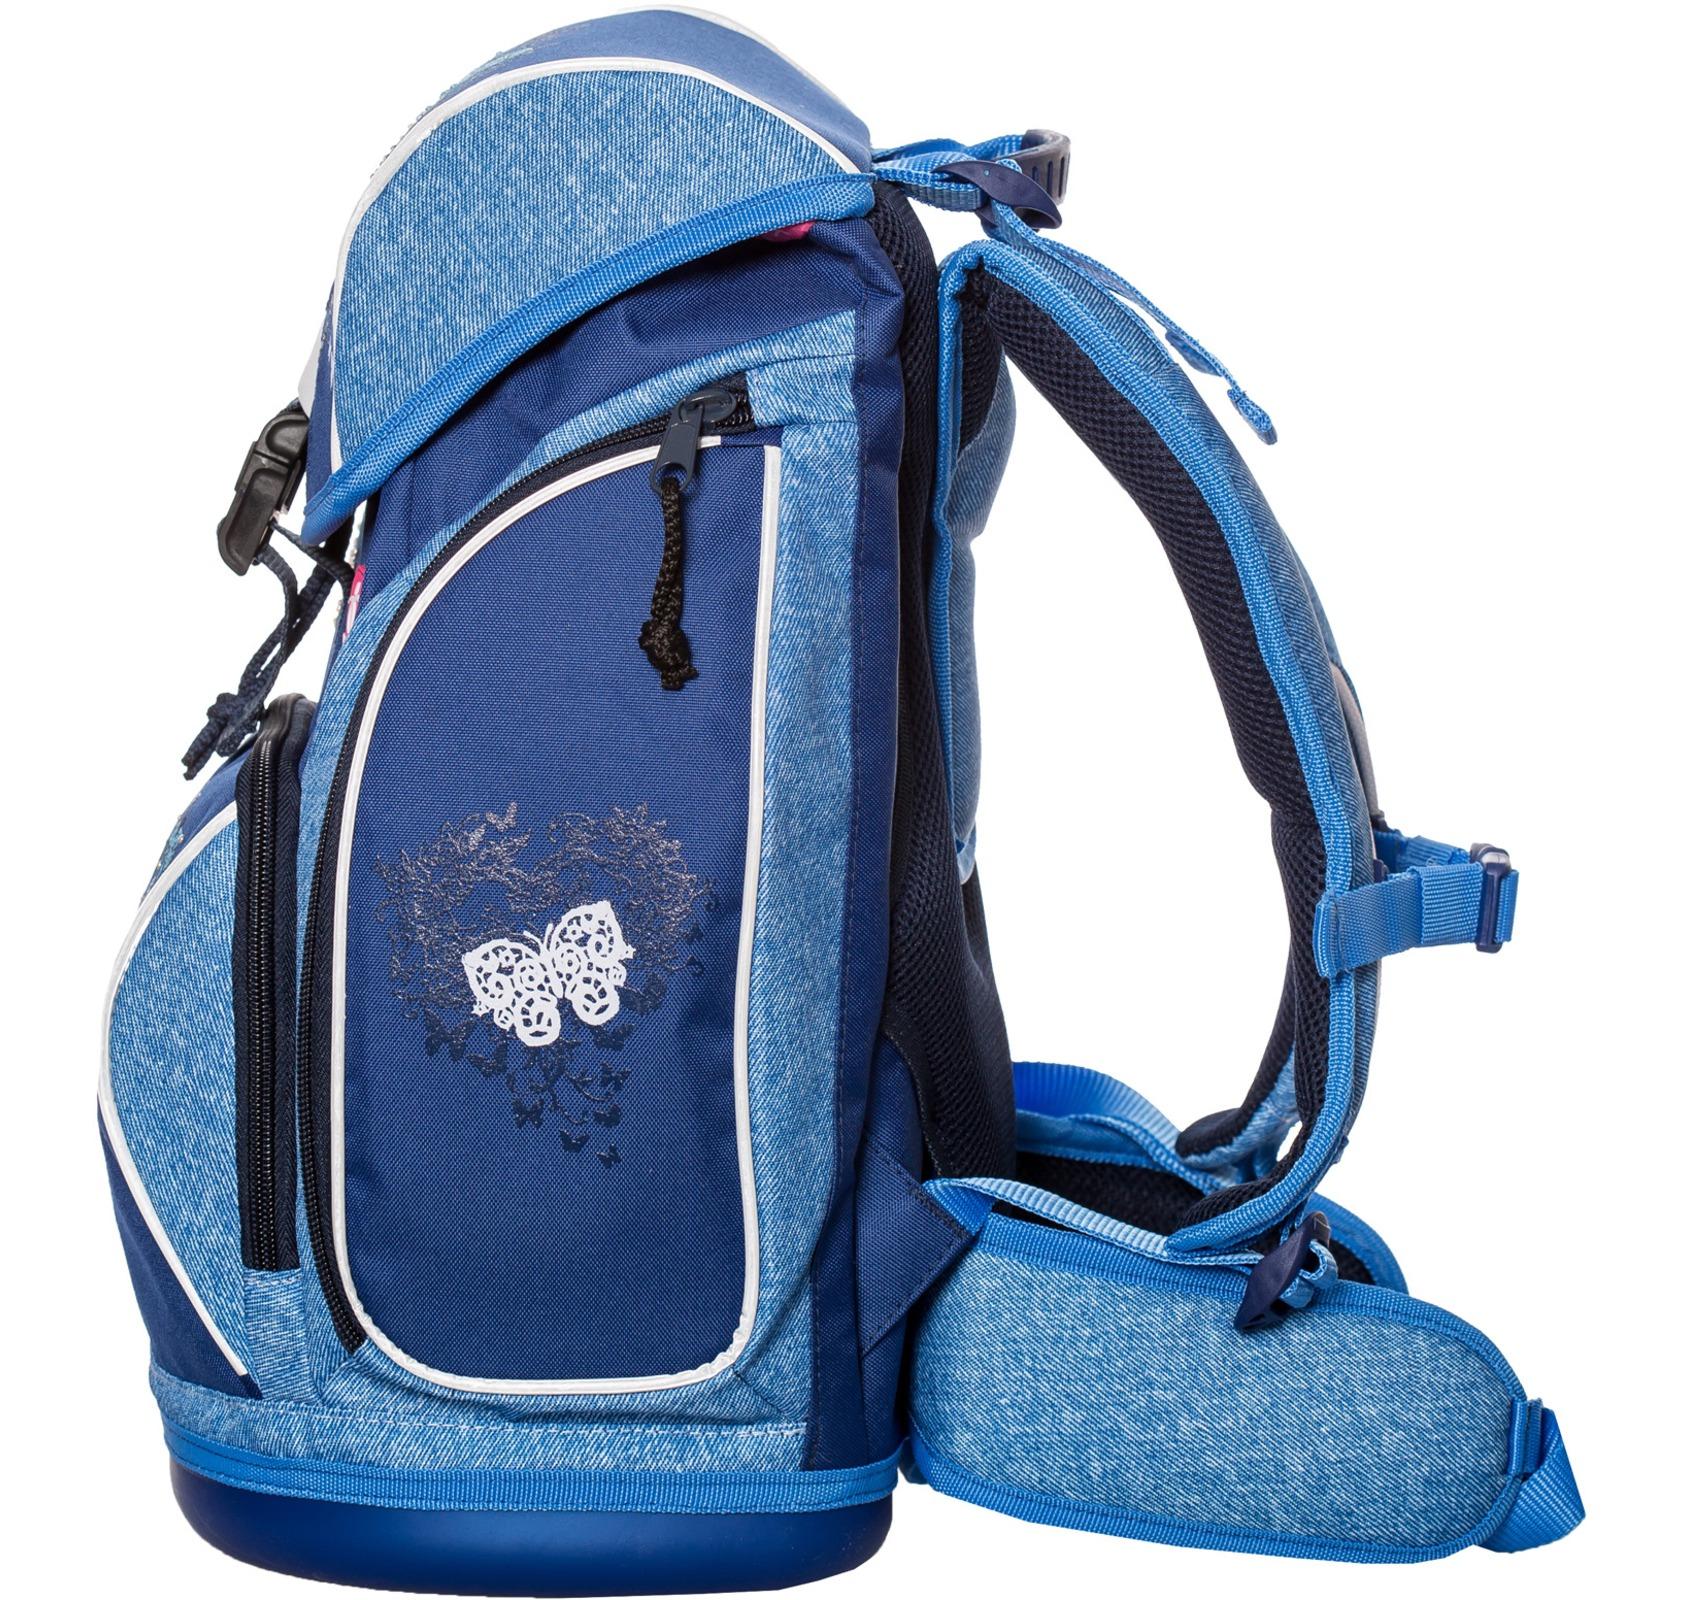 Ранец-рюкзак Belmil 404-31/467 цвет Butterfly Новинка, - фото 4